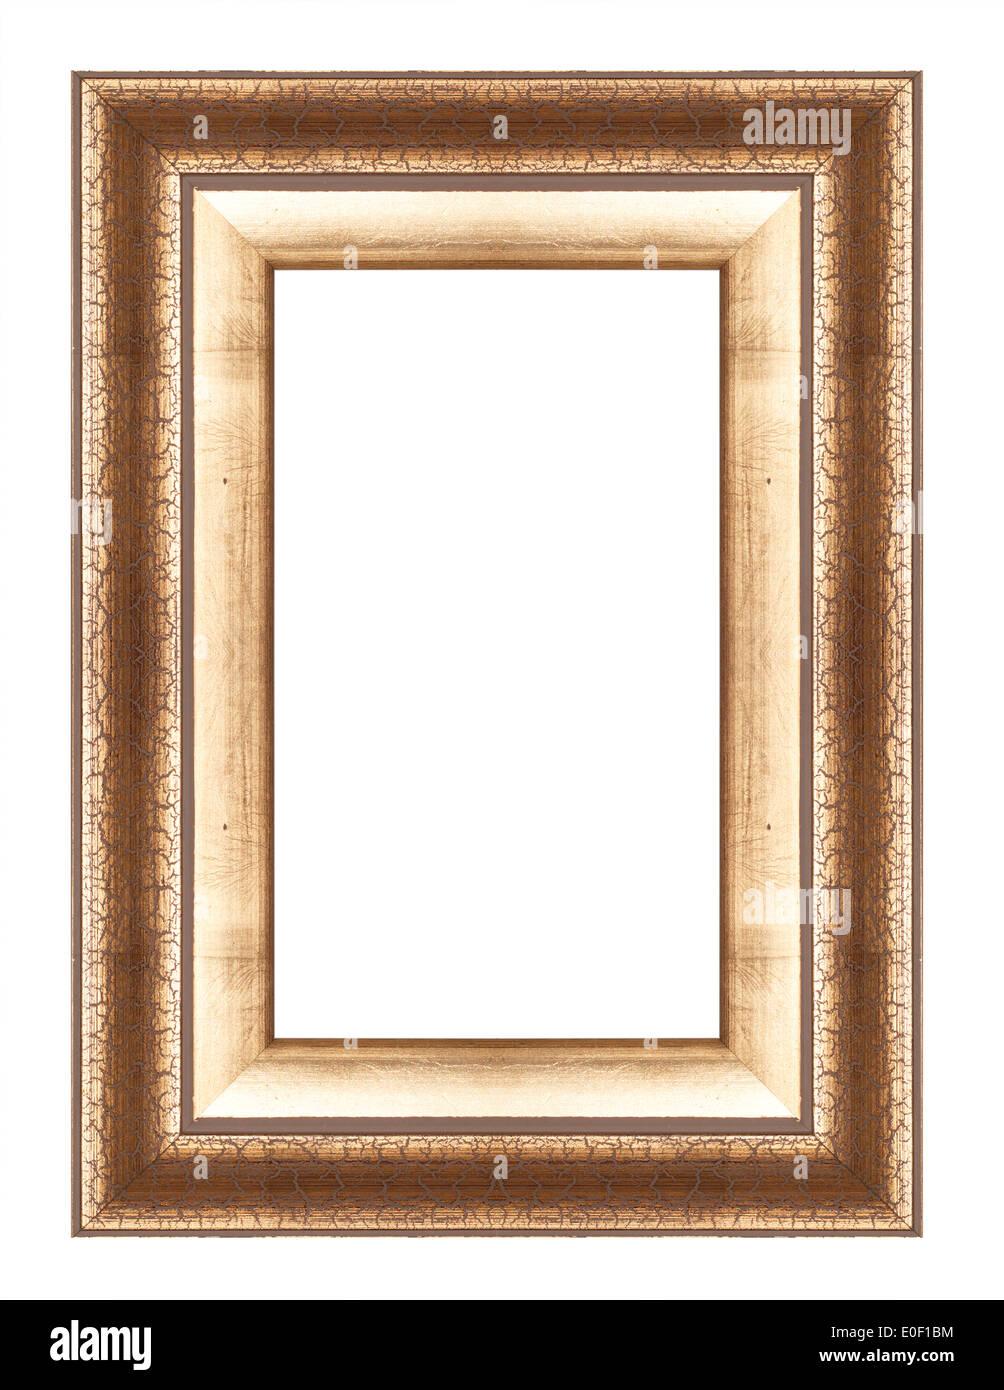 Old antique gold frame isolated decorative carved wood stand old antique gold frame isolated decorative carved wood stand antique black frame isolated on white background jeuxipadfo Image collections